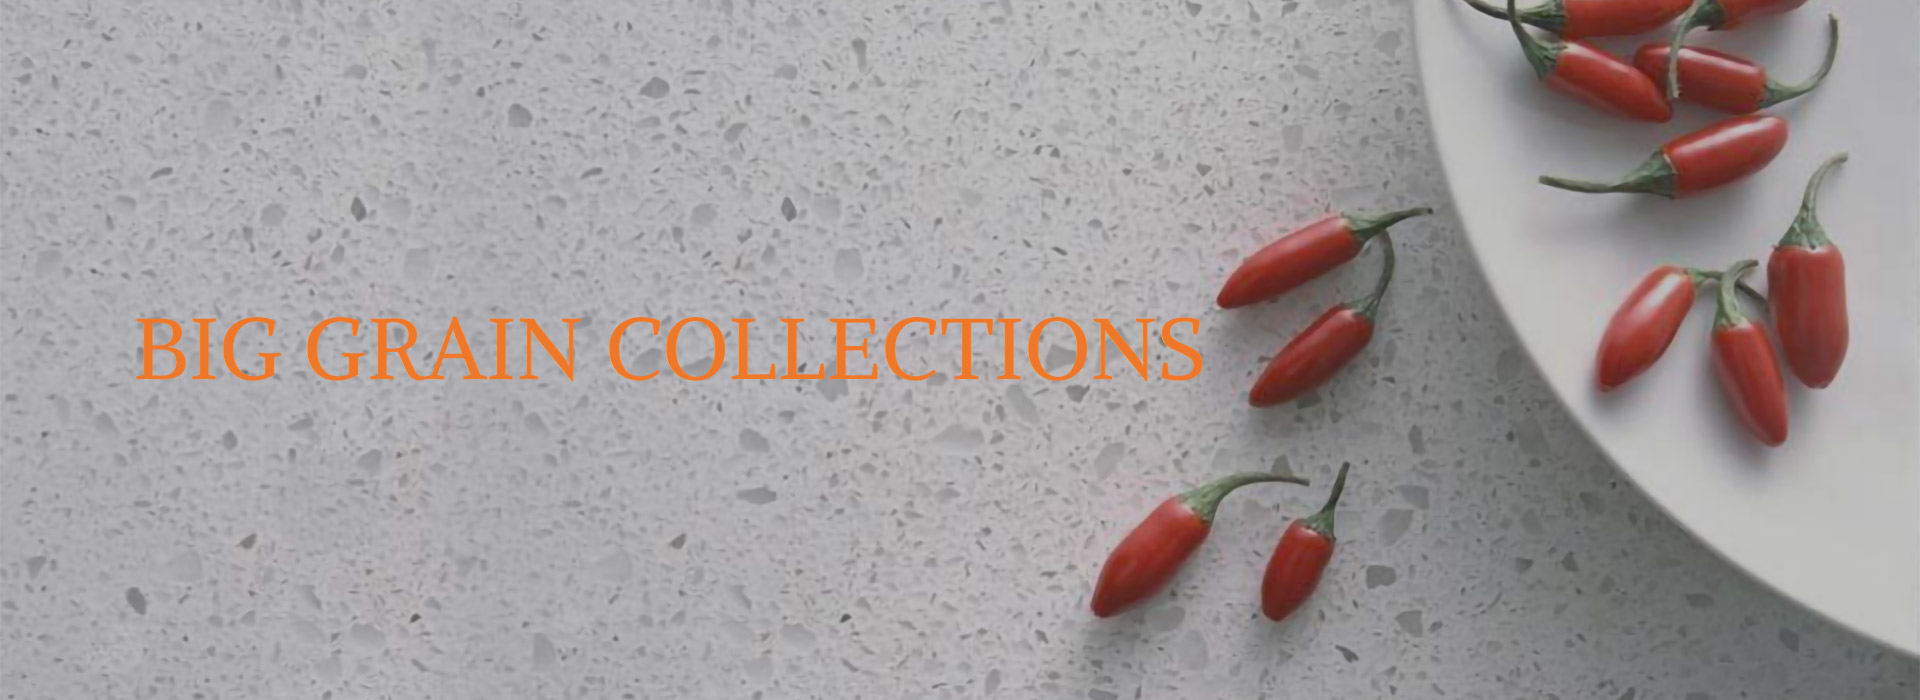 Big Grain Collection